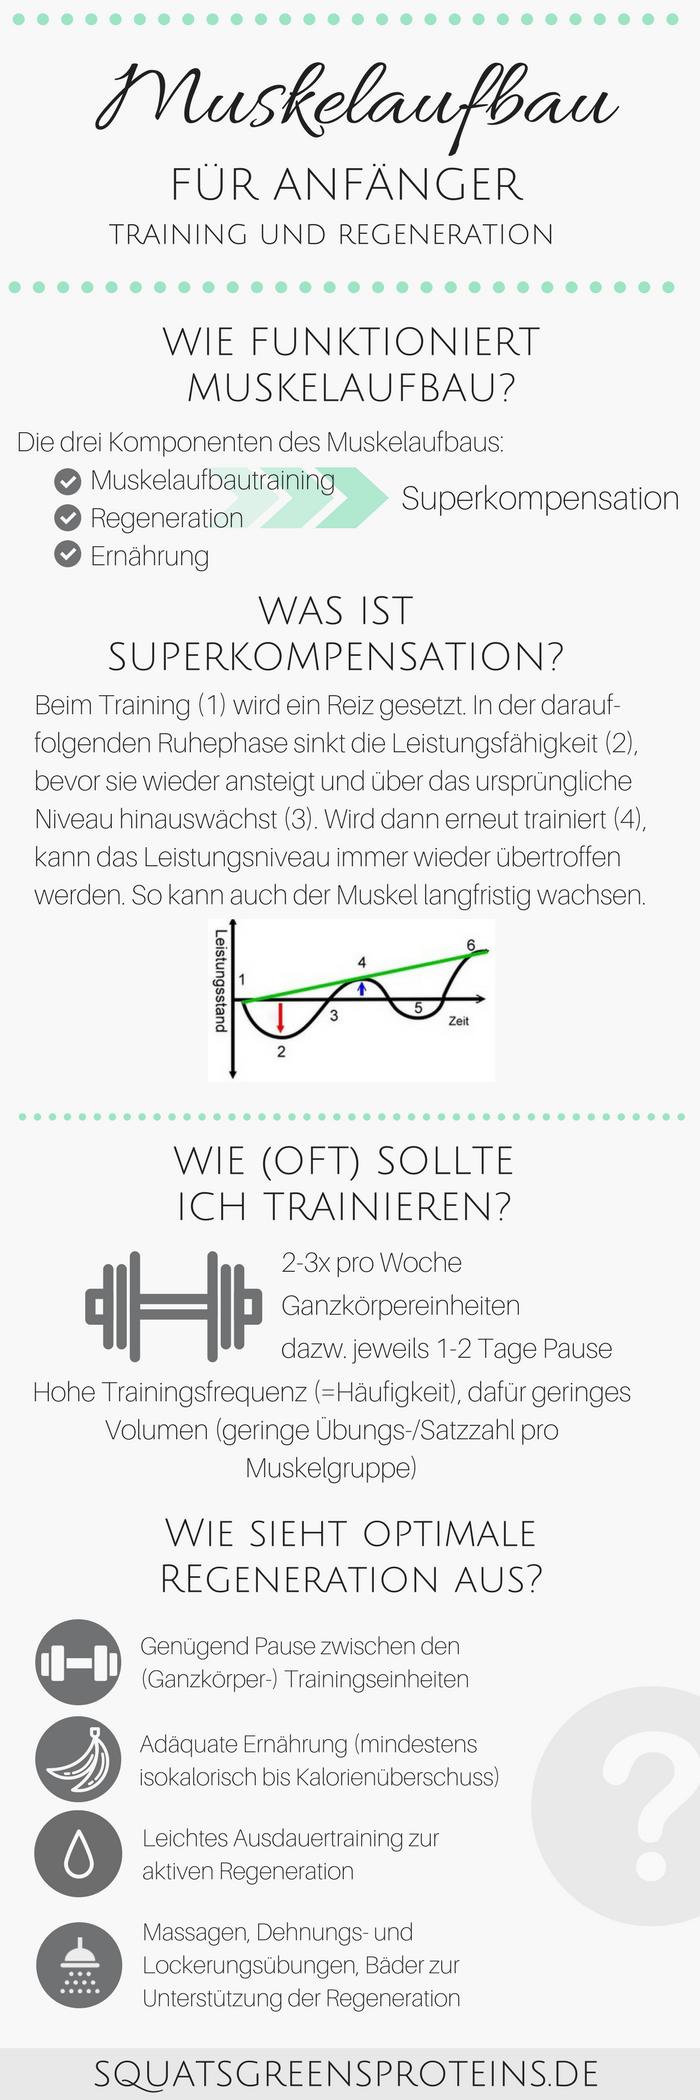 #frmuskelaufbautraining #muskelaufbautraining #proteinstraining #krafttraining #muskelaufbau #regene...